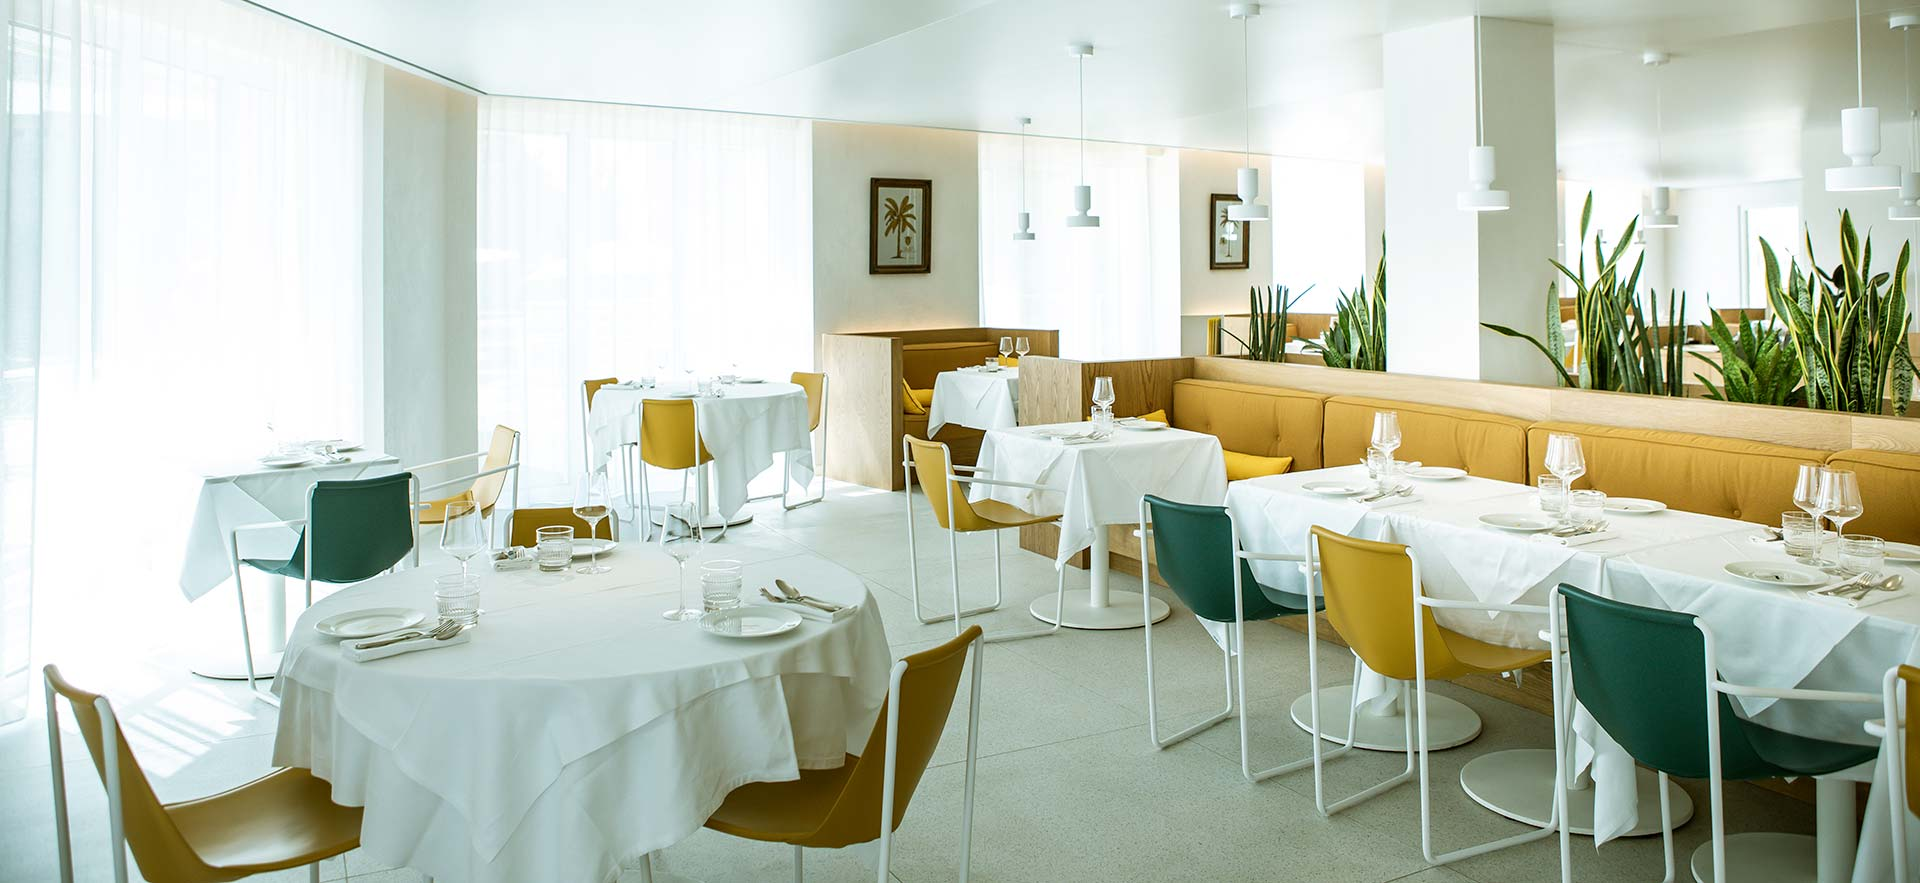 Restaurant en bas